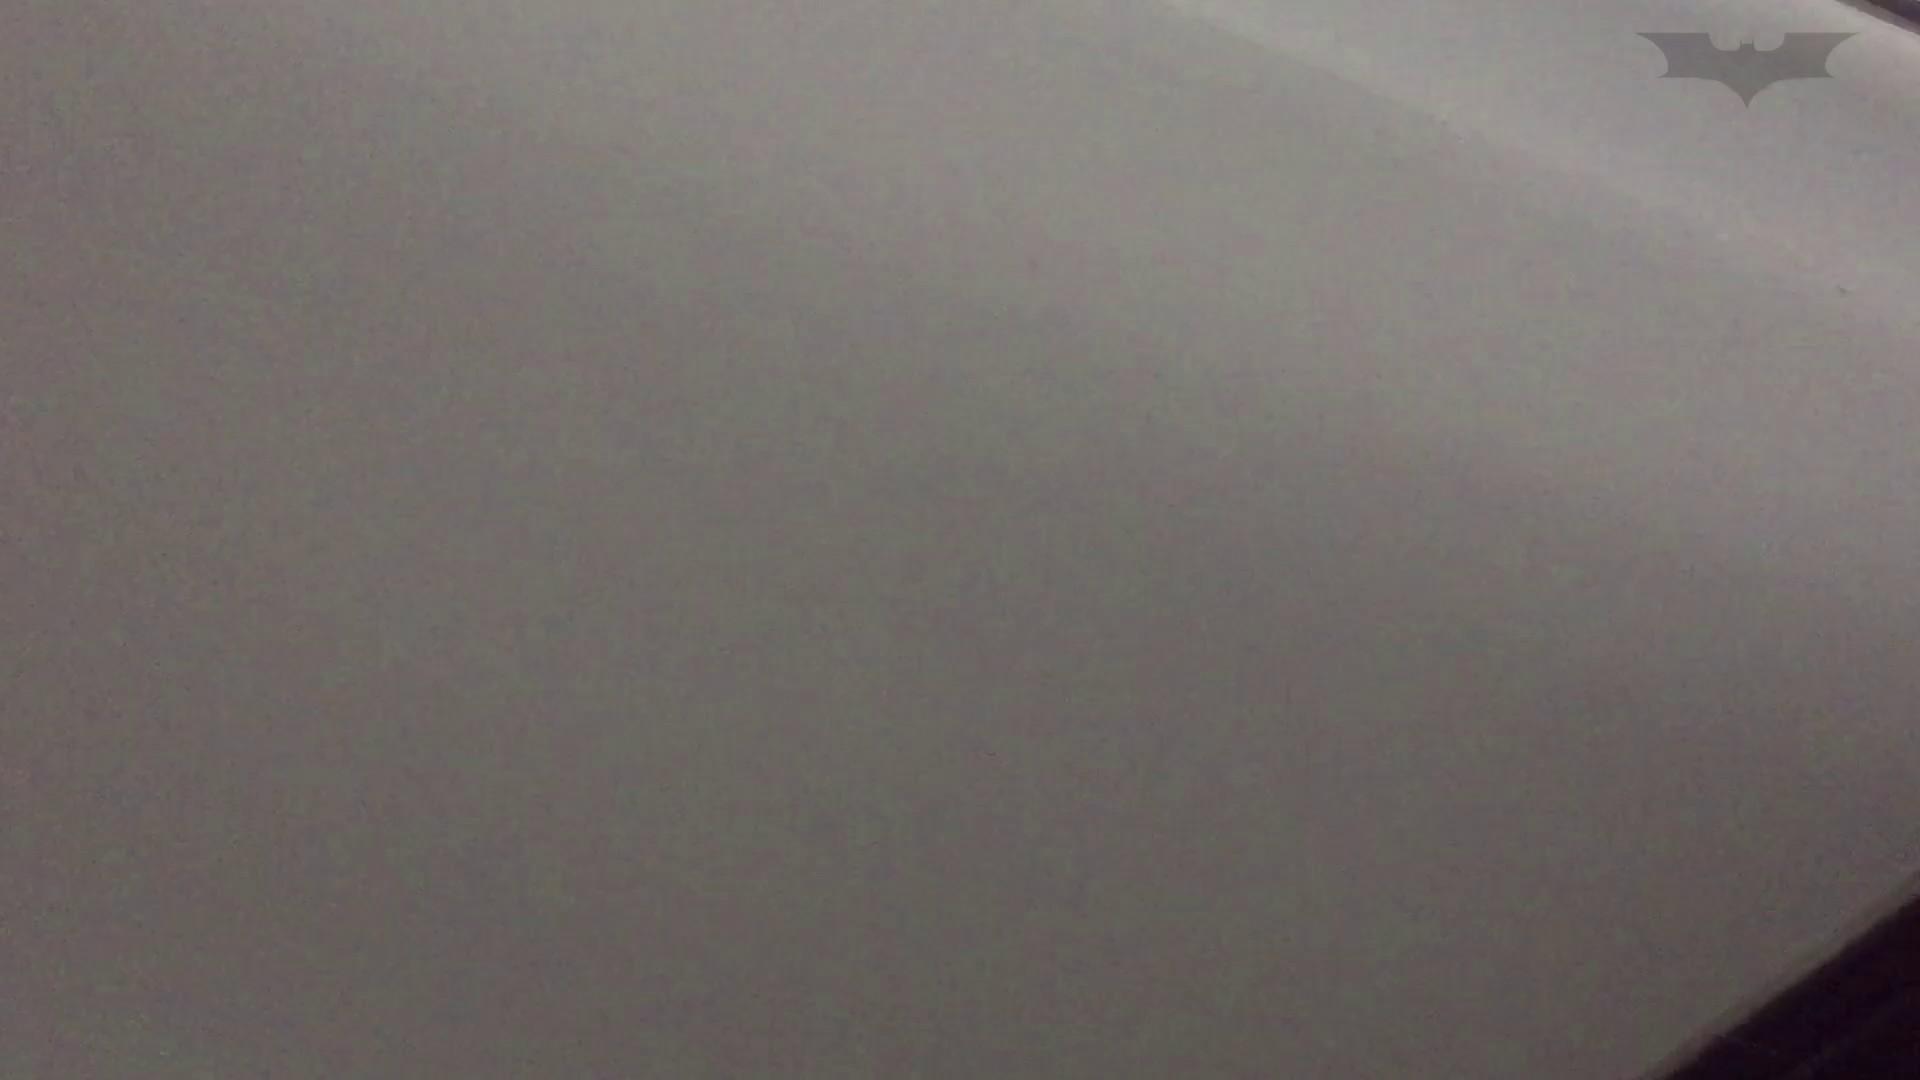 JD盗撮 美女の洗面所の秘密 Vol.74 OLの実態 盗撮ワレメ無修正動画無料 91pic 62